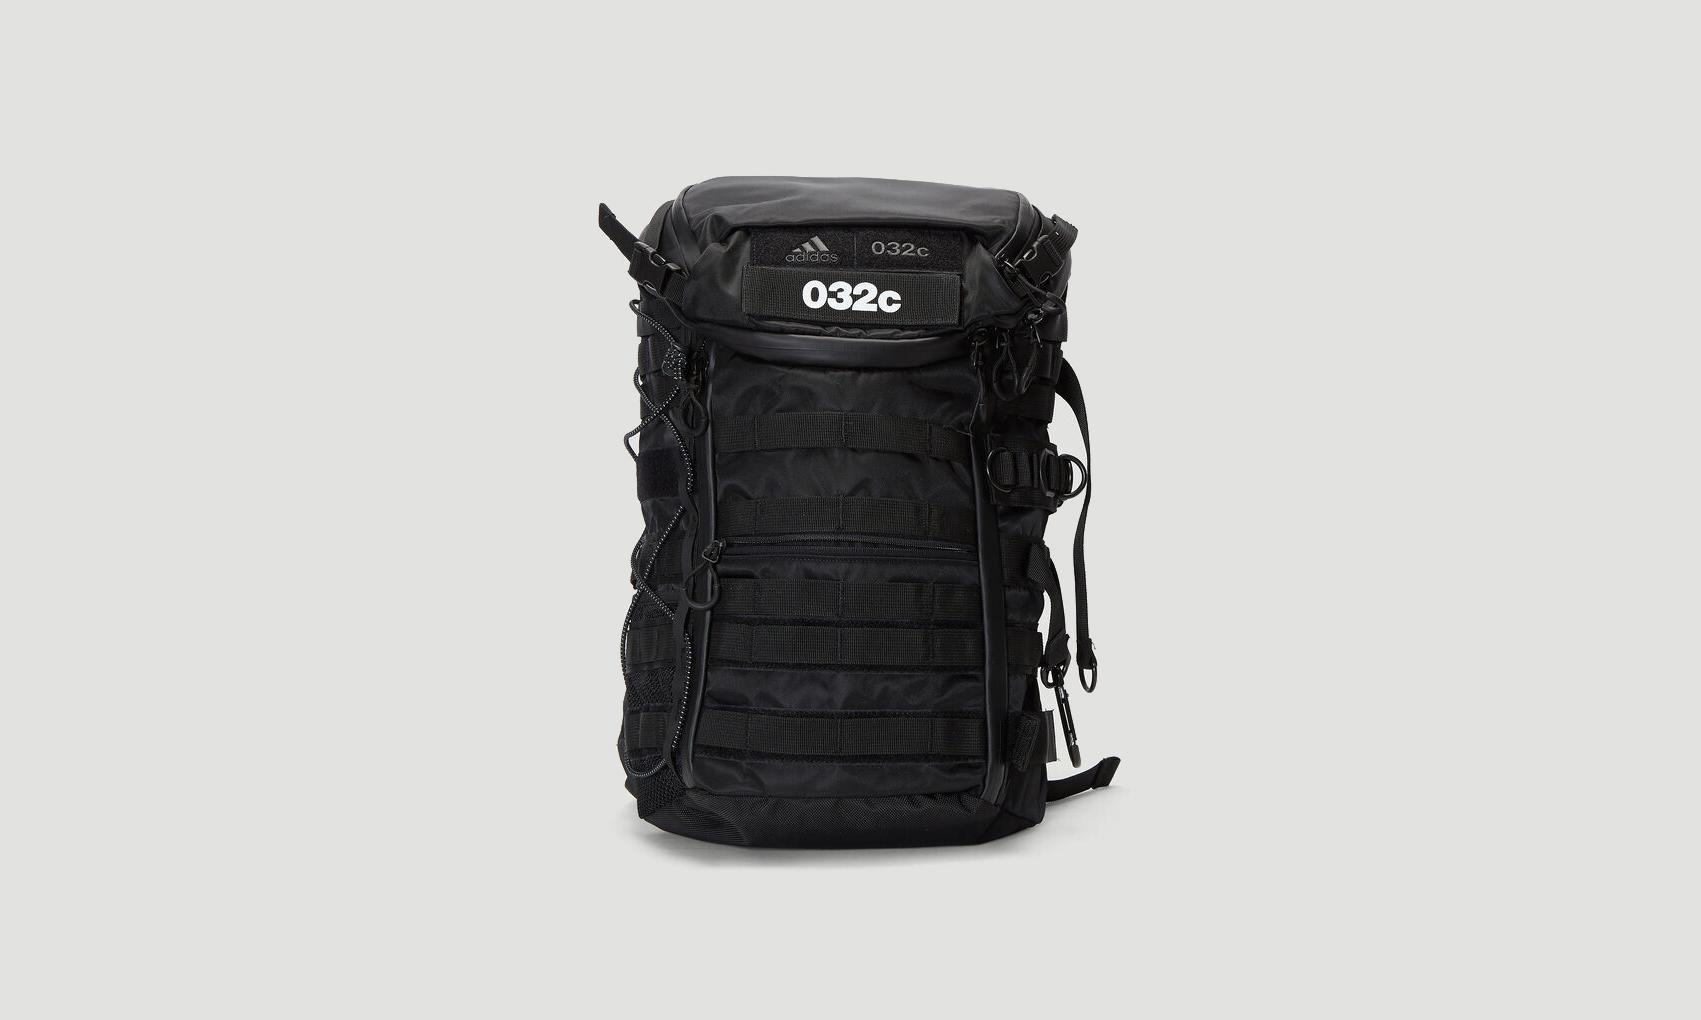 032c x adidas 联乘包袋系列正式上架